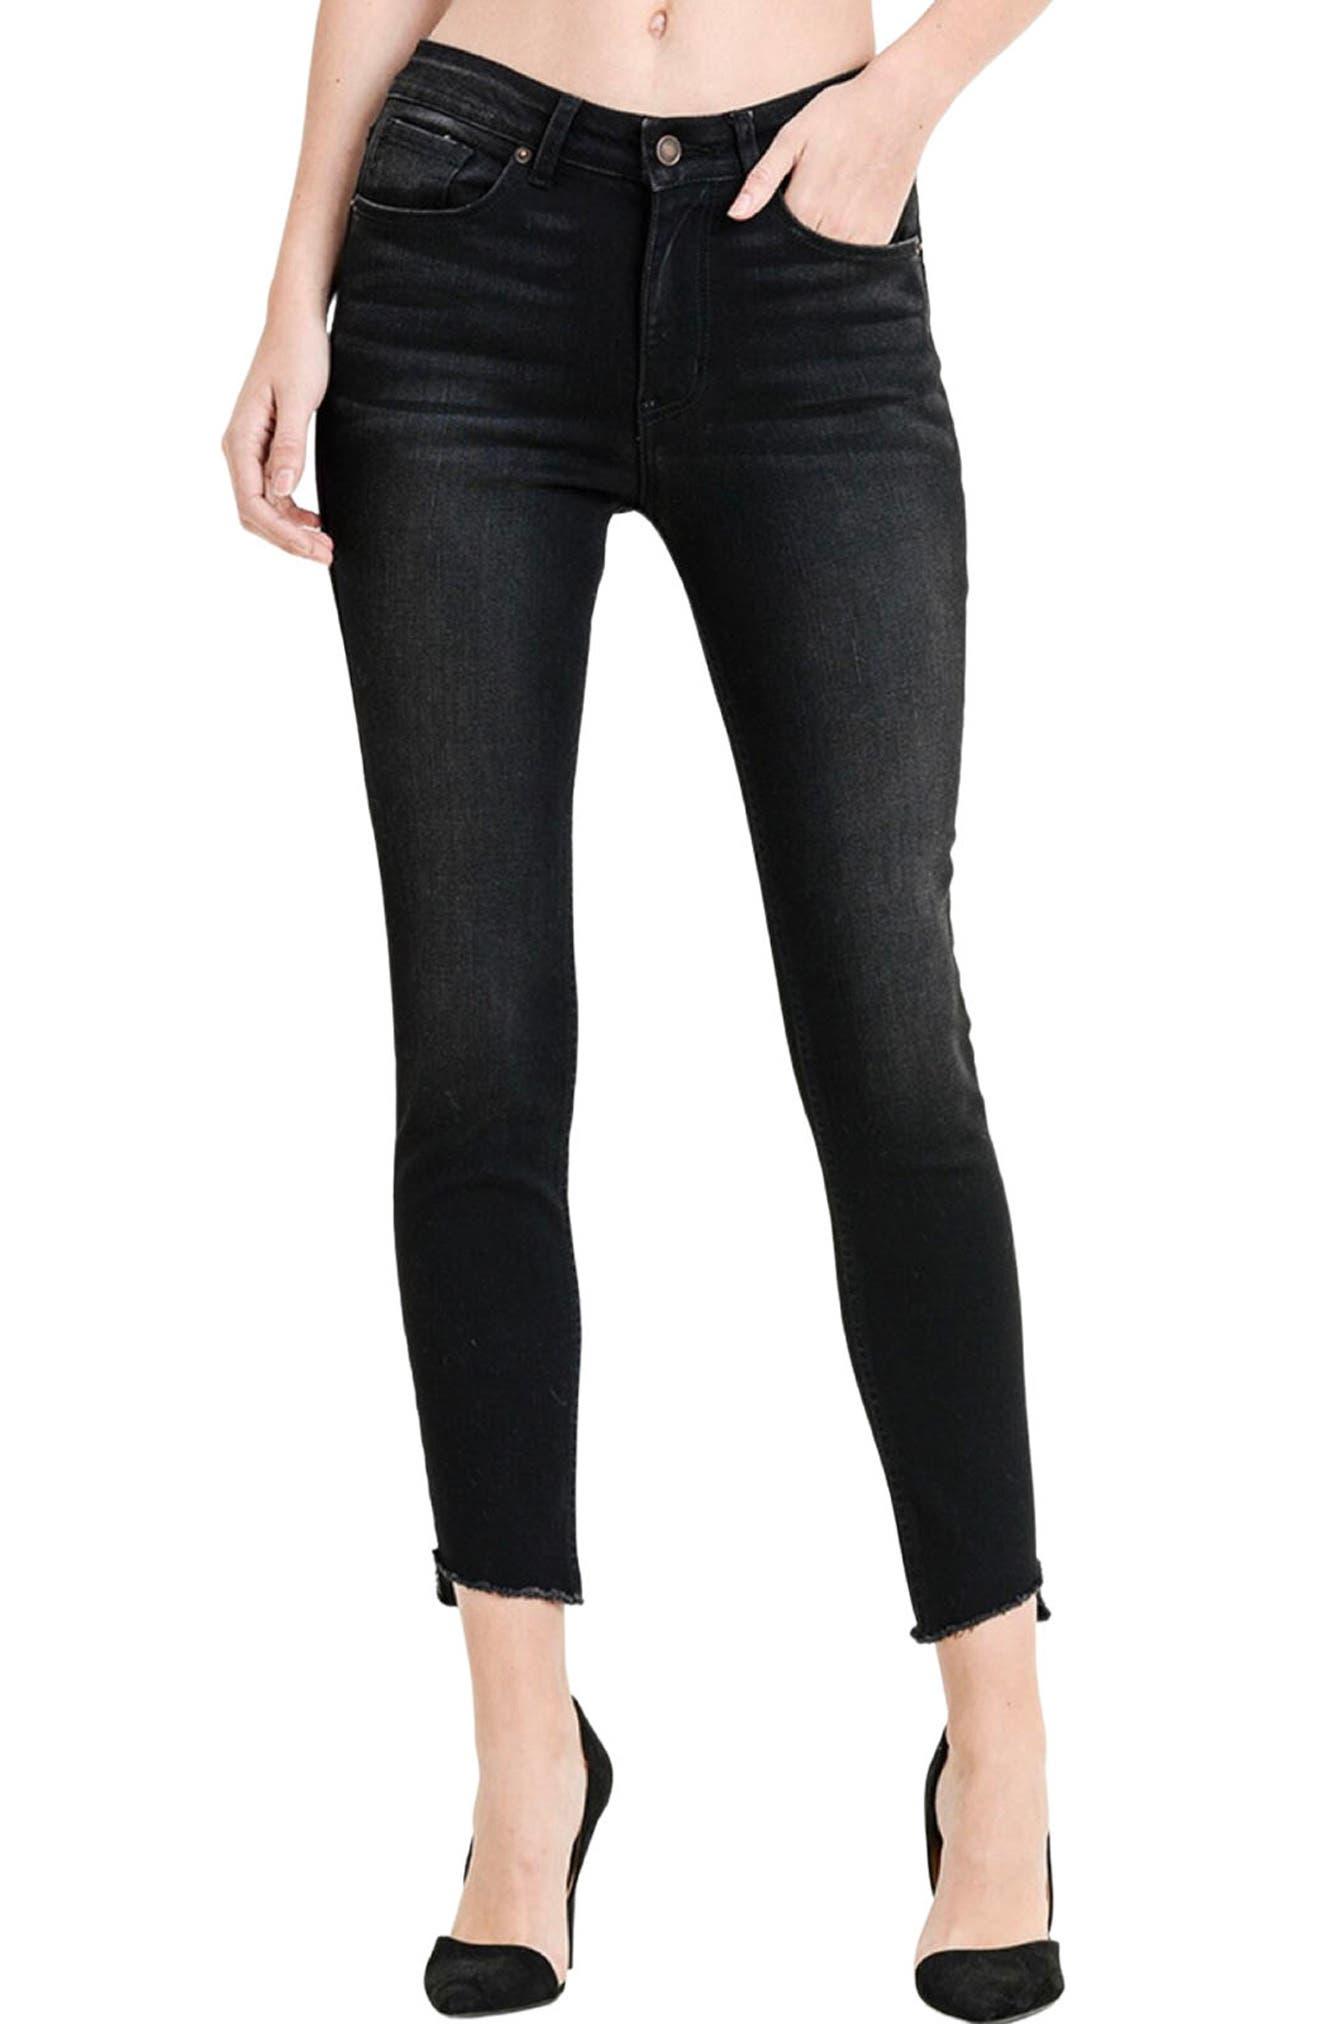 Verona High Waist Slant Hem Ankle Skinny Jeans